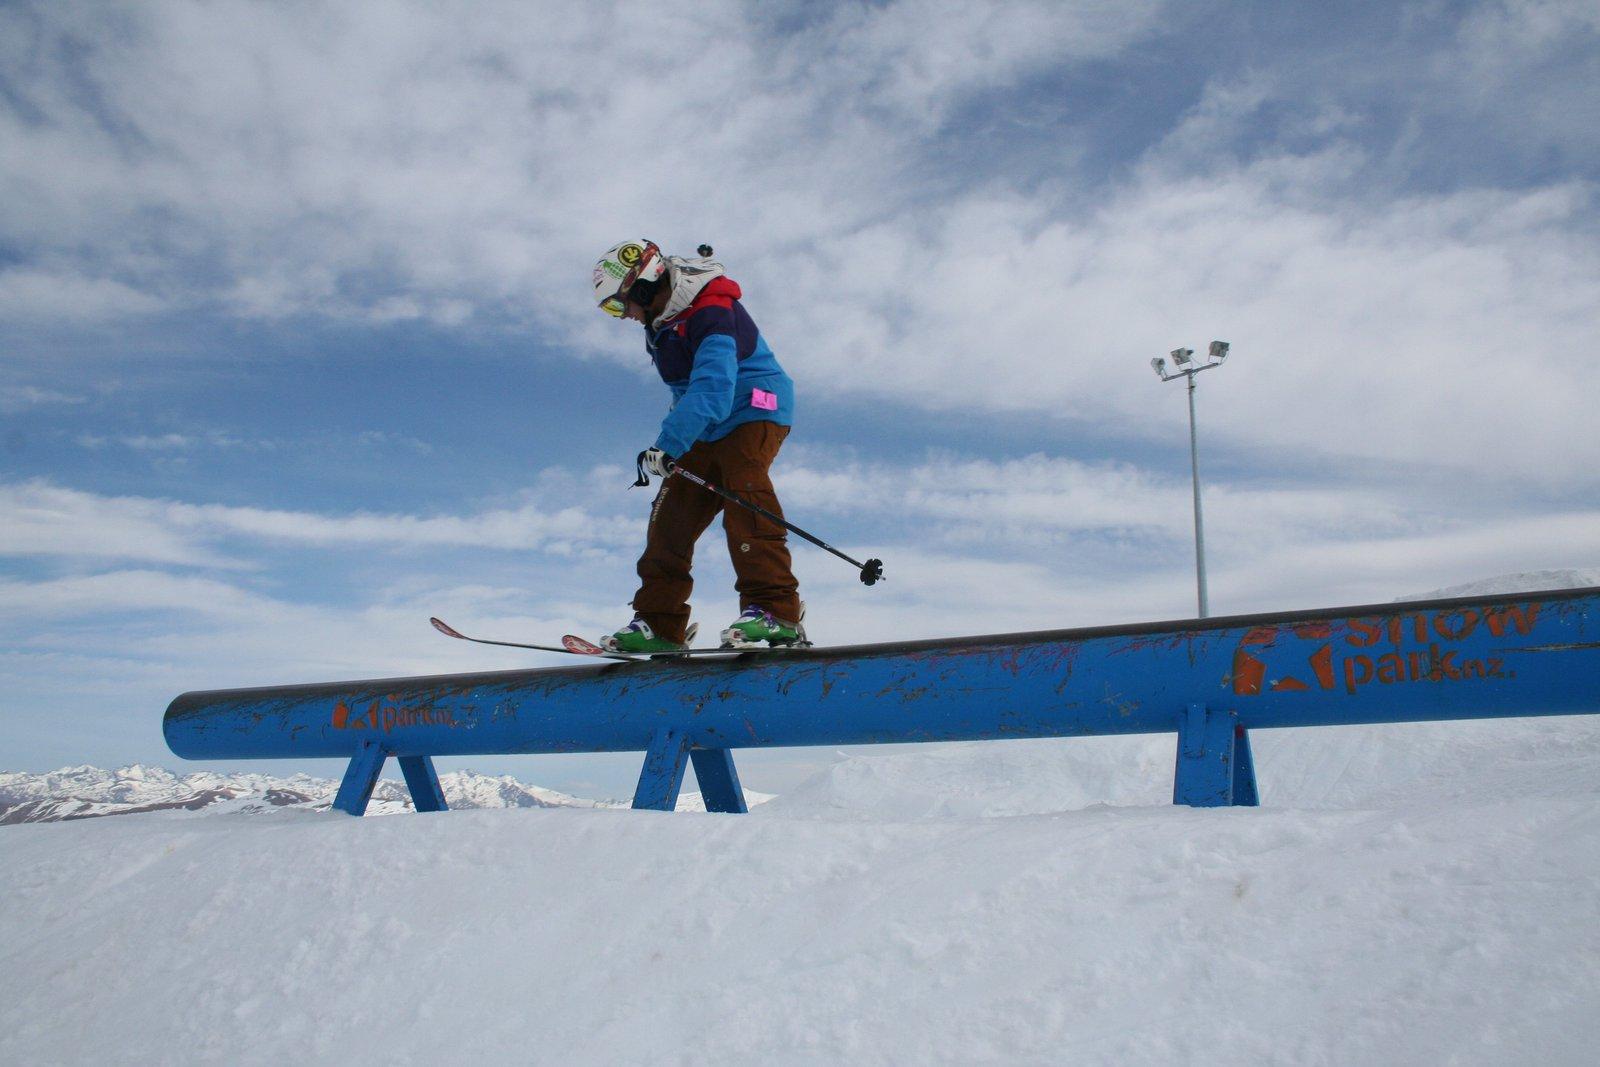 Snow park Pipe rail